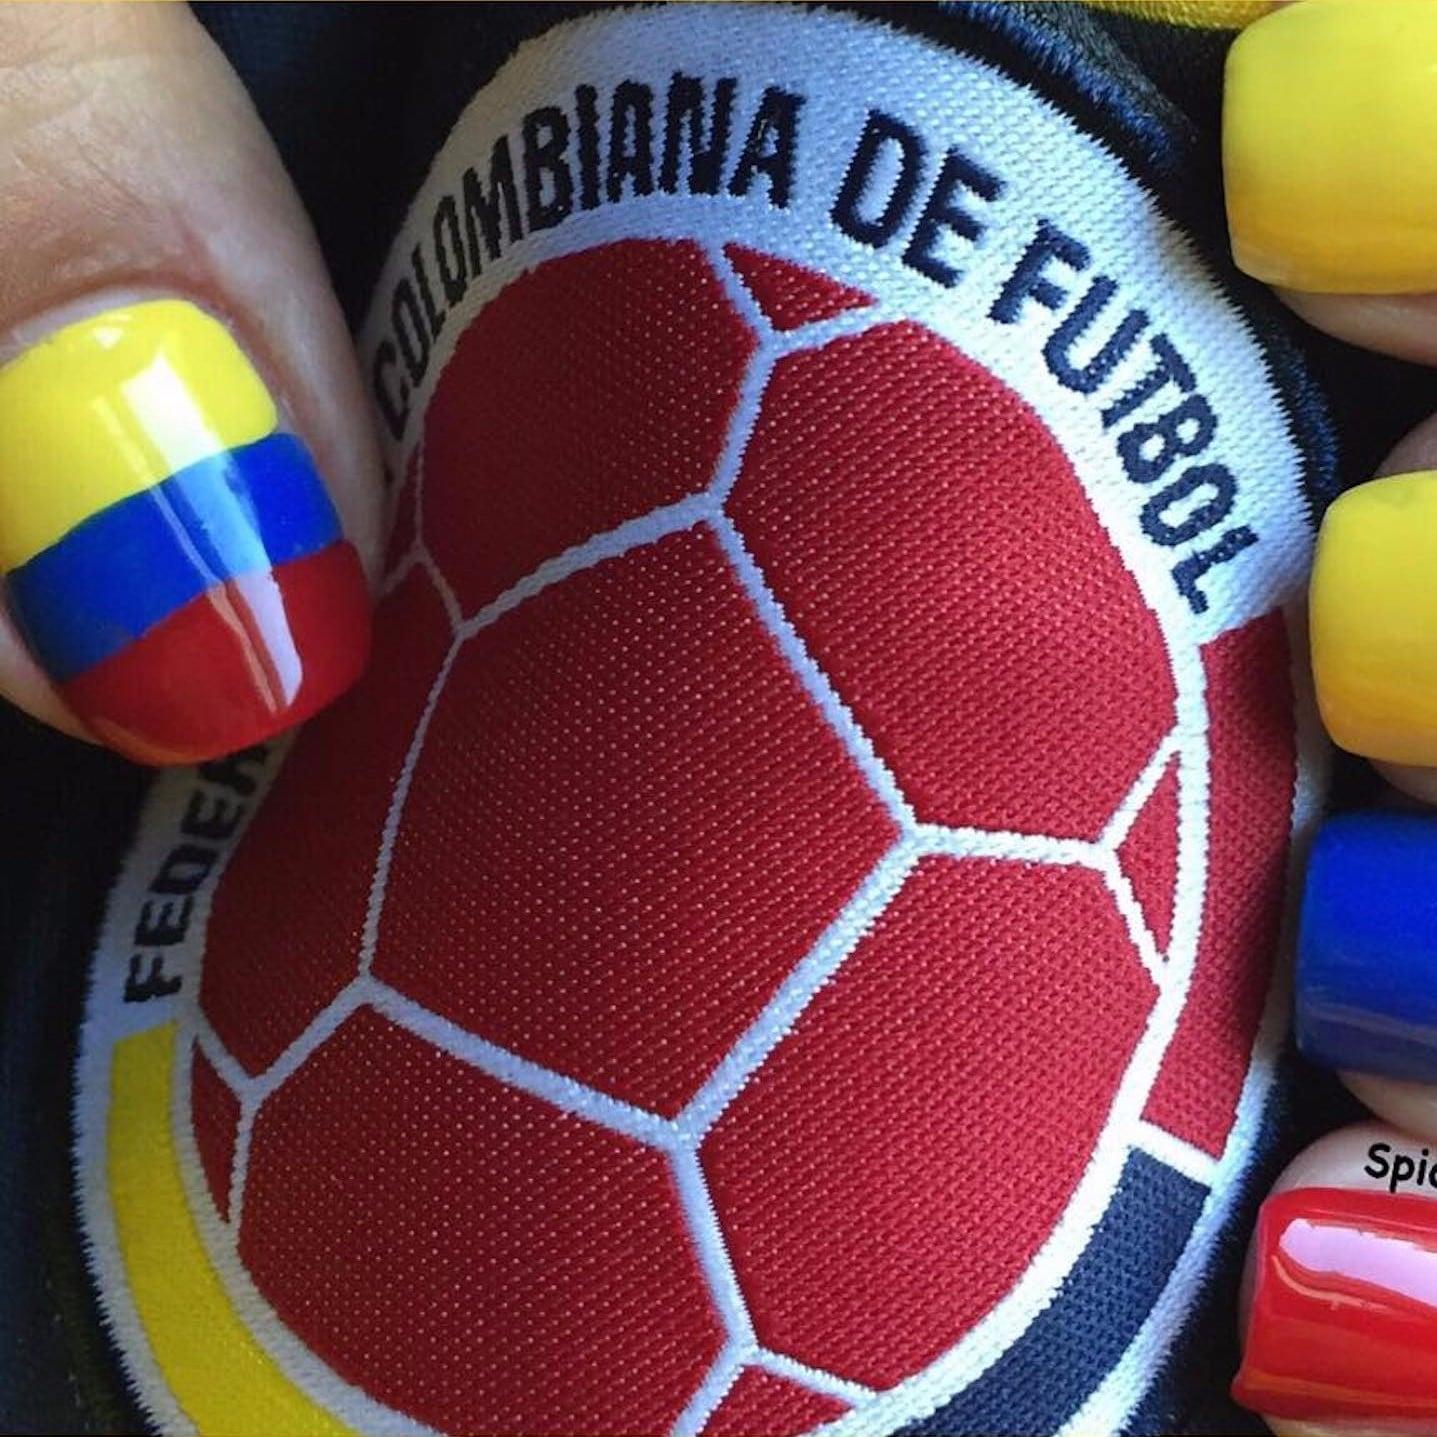 The Colombian Flag Latinx Pride Nail Art Ideas Popsugar Latina